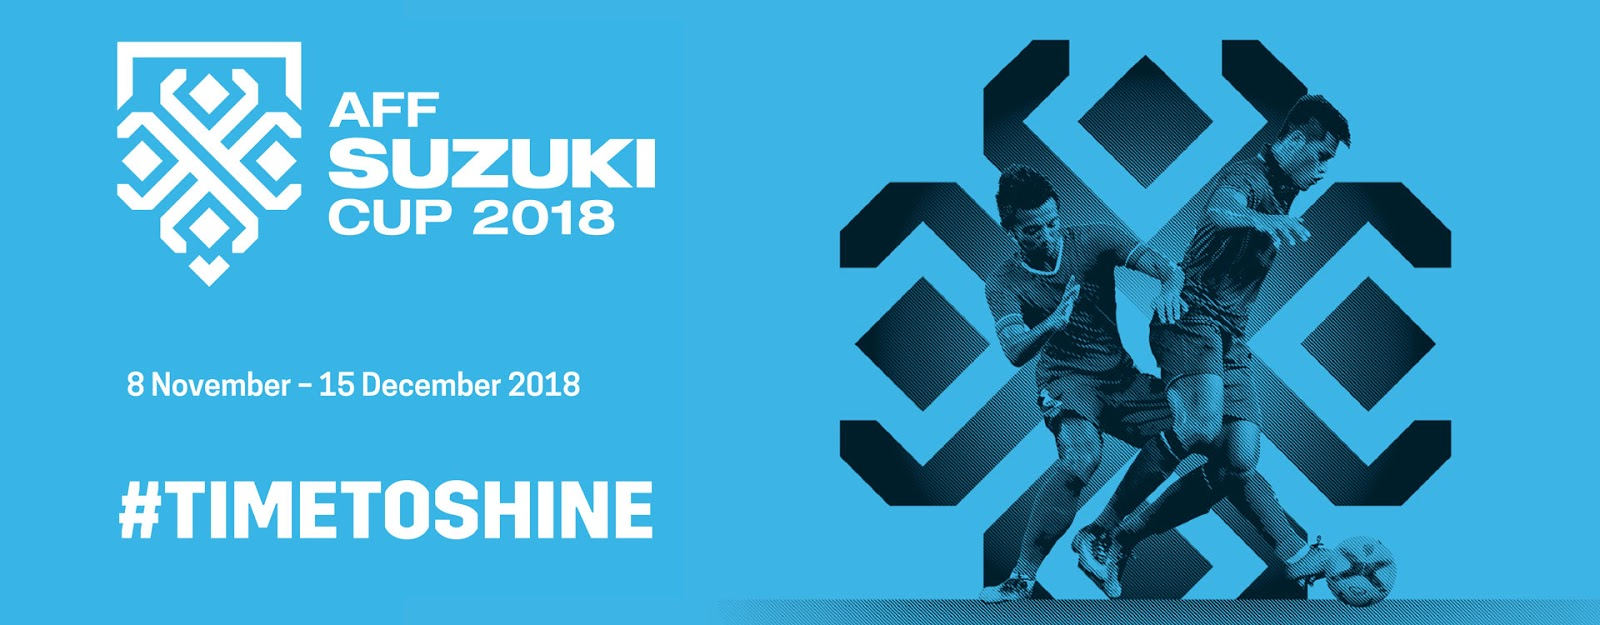 Suzuki Siapkan Program Menarik Sambut AFF Suzuki Cup 2018